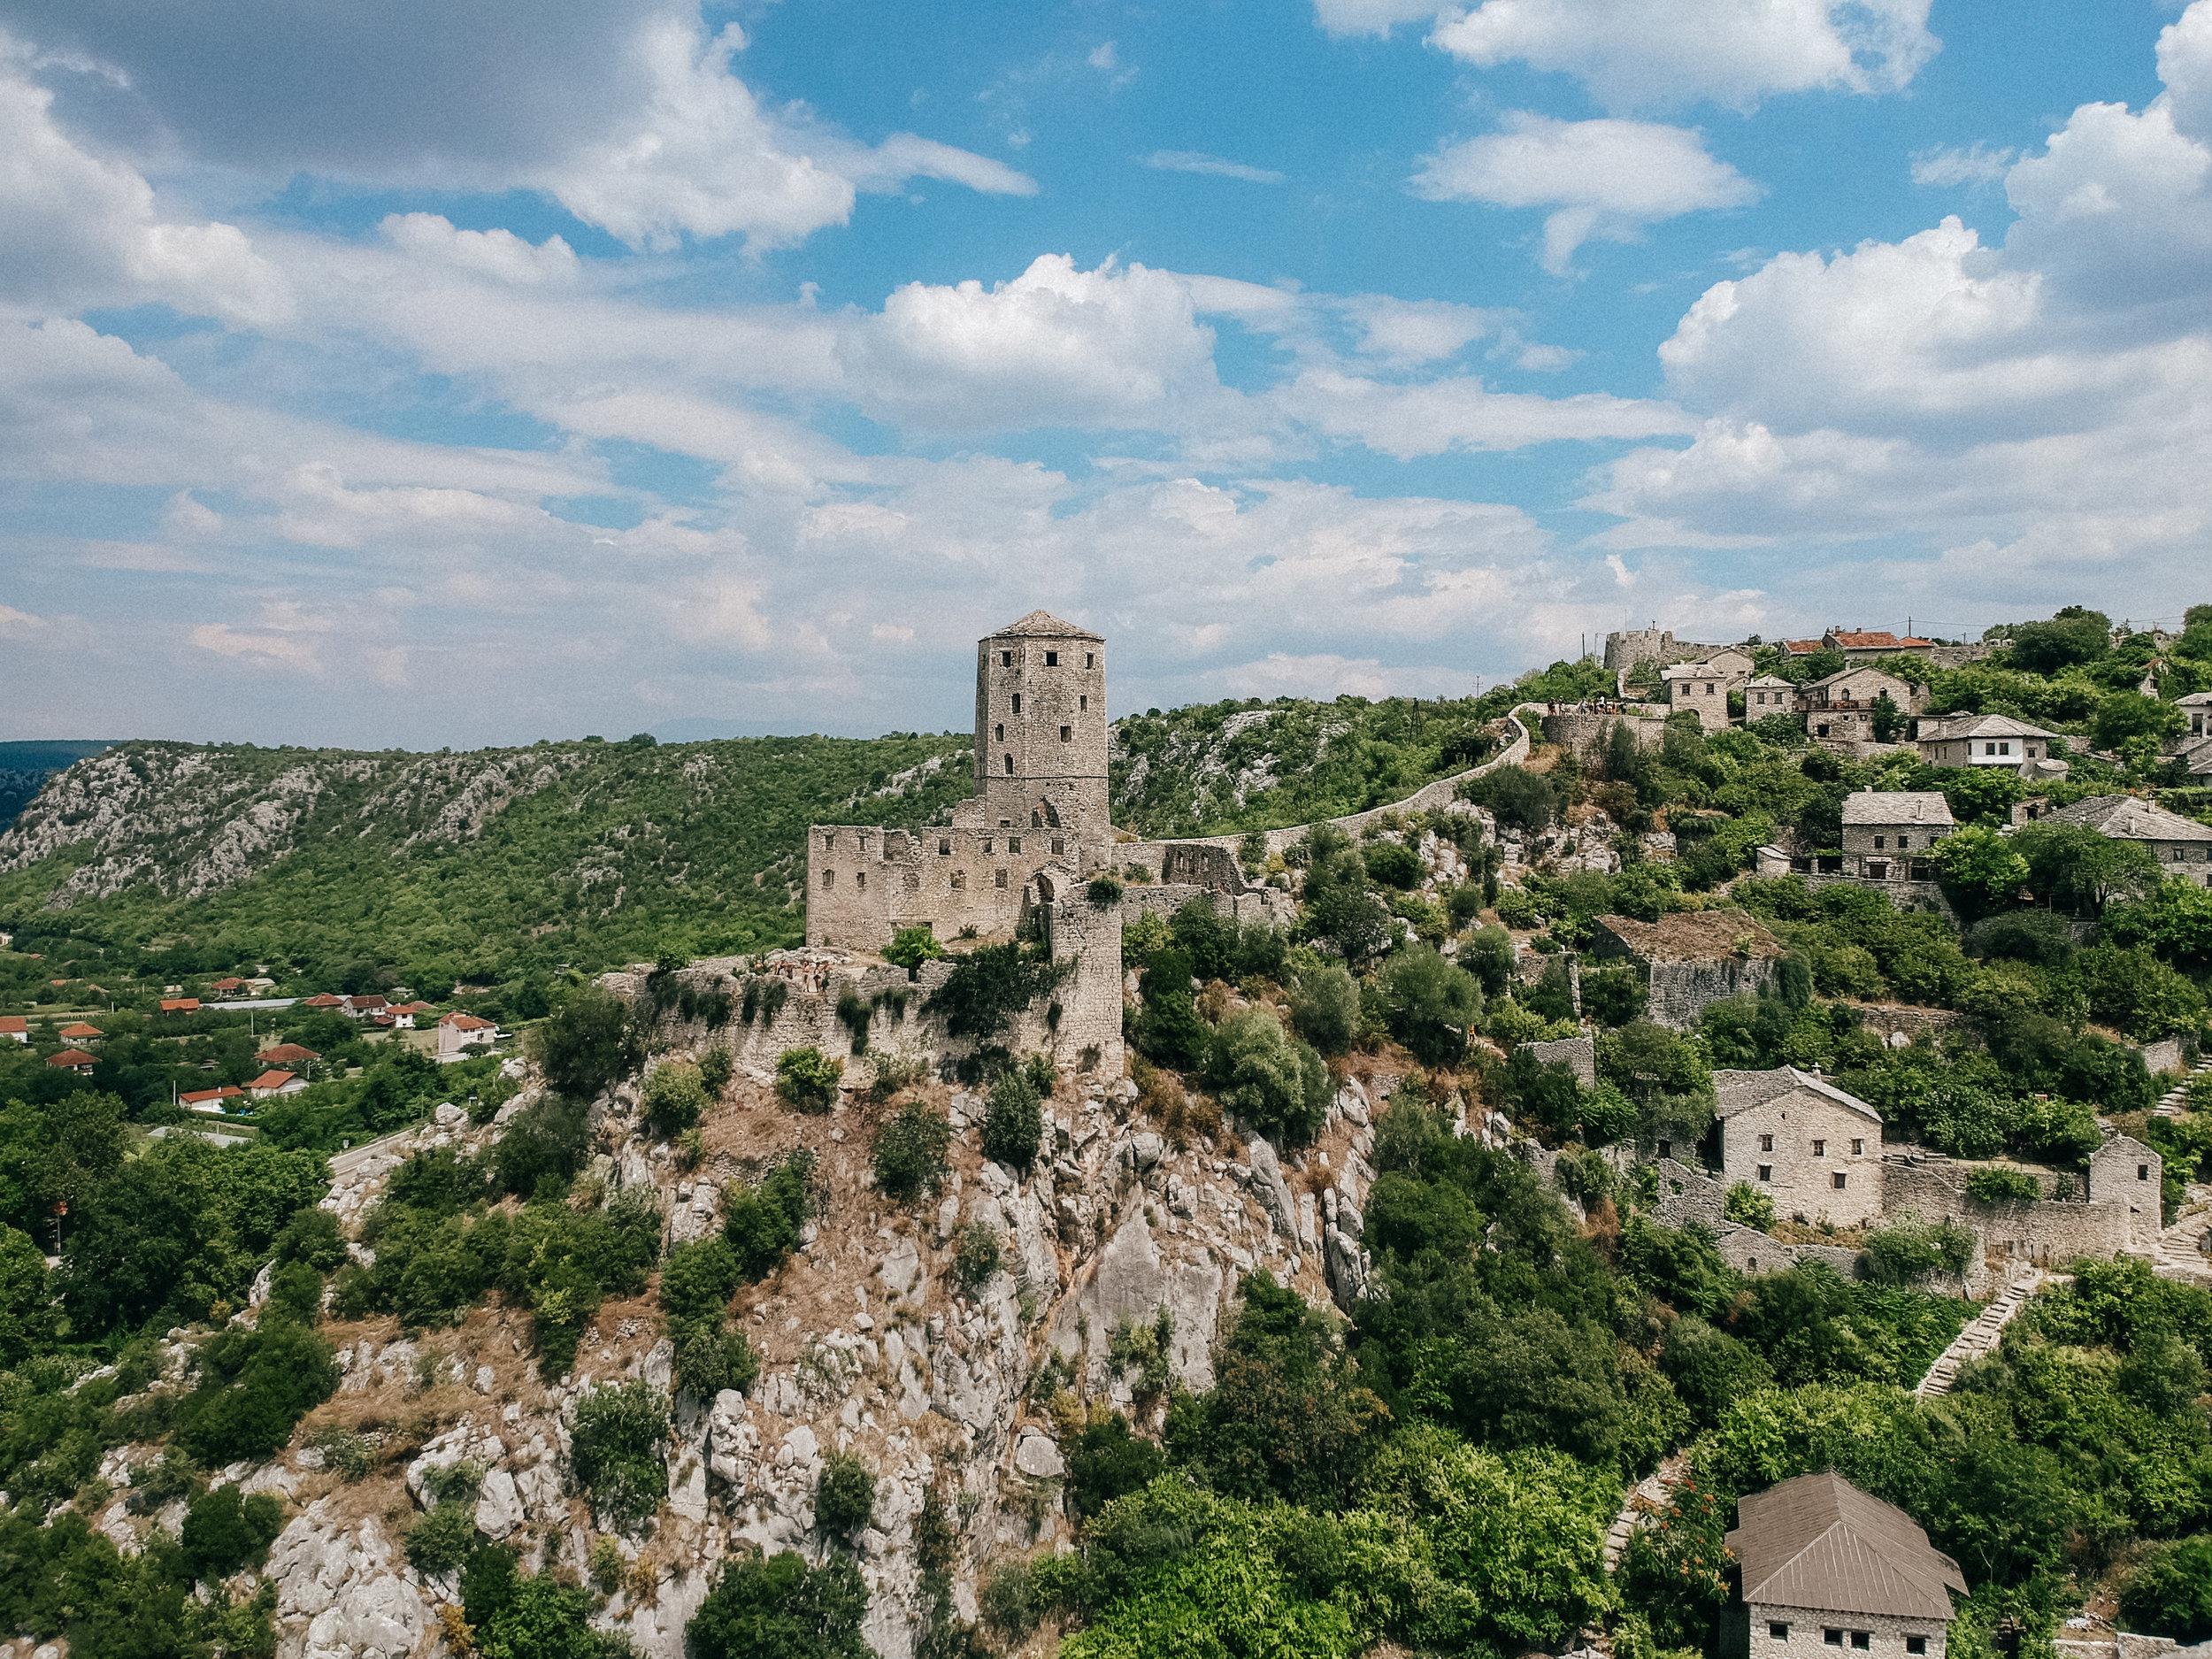 Počitelj Fortress (drone view)